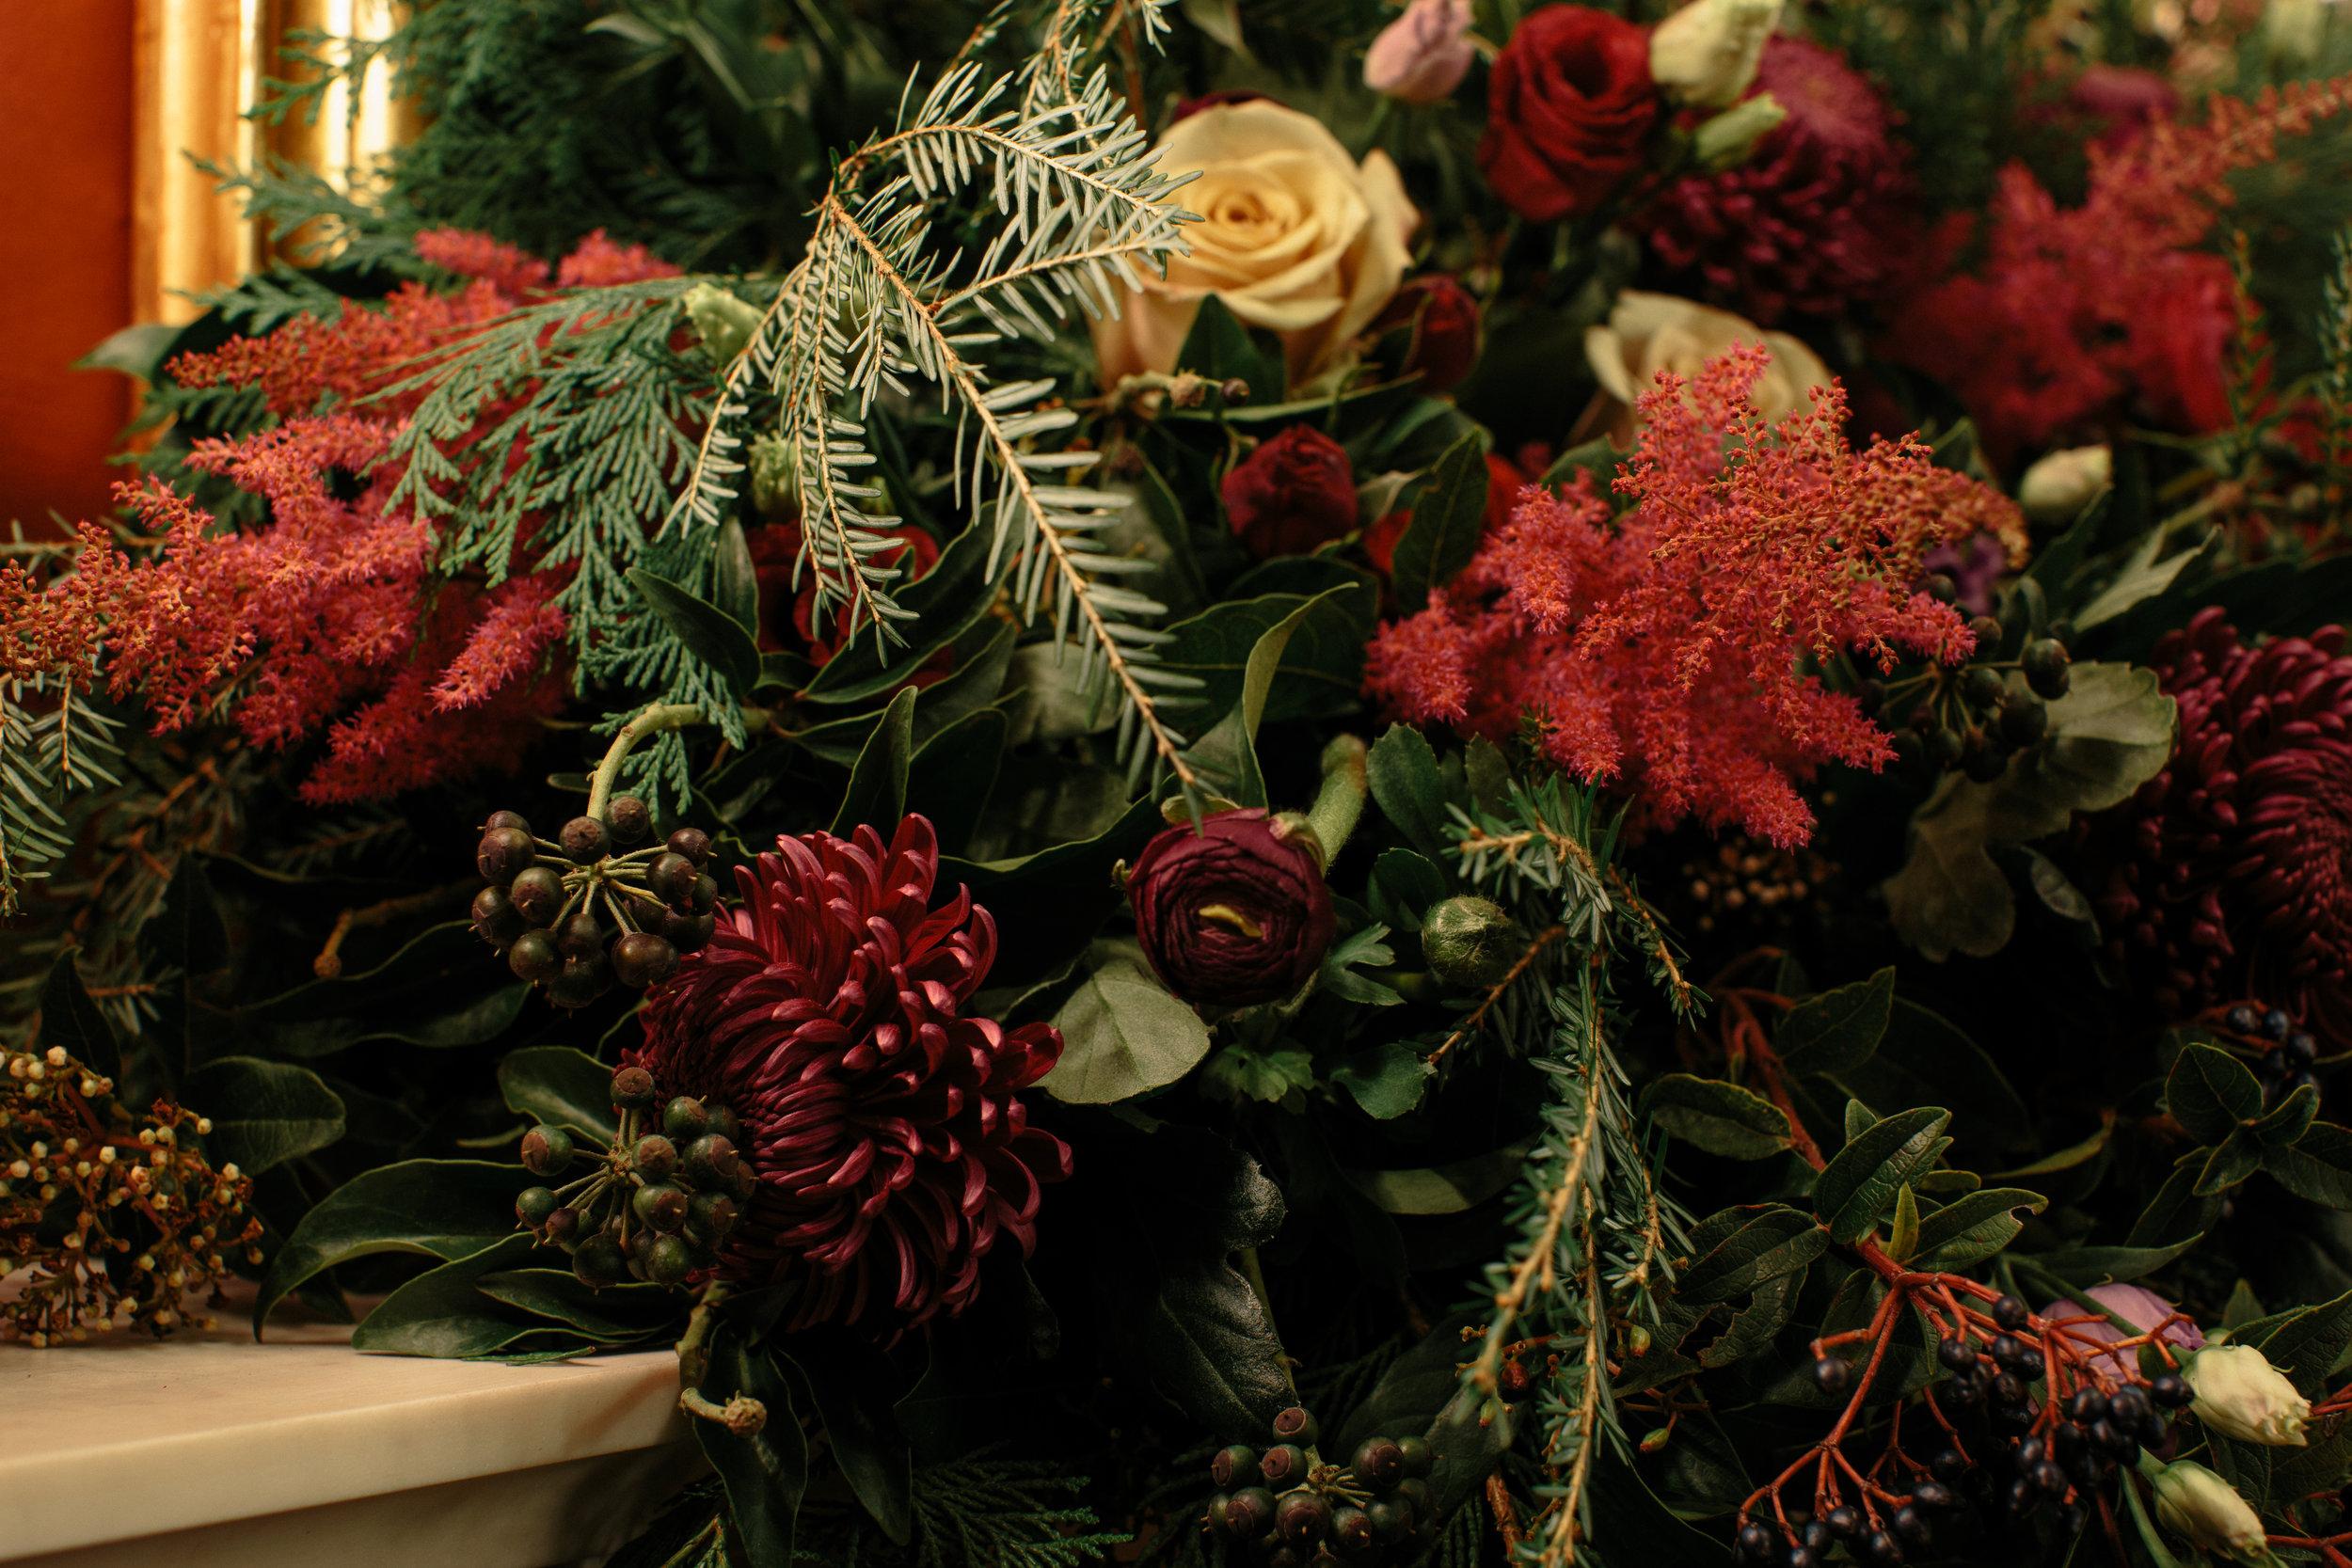 floral garland fireplace London Christmas